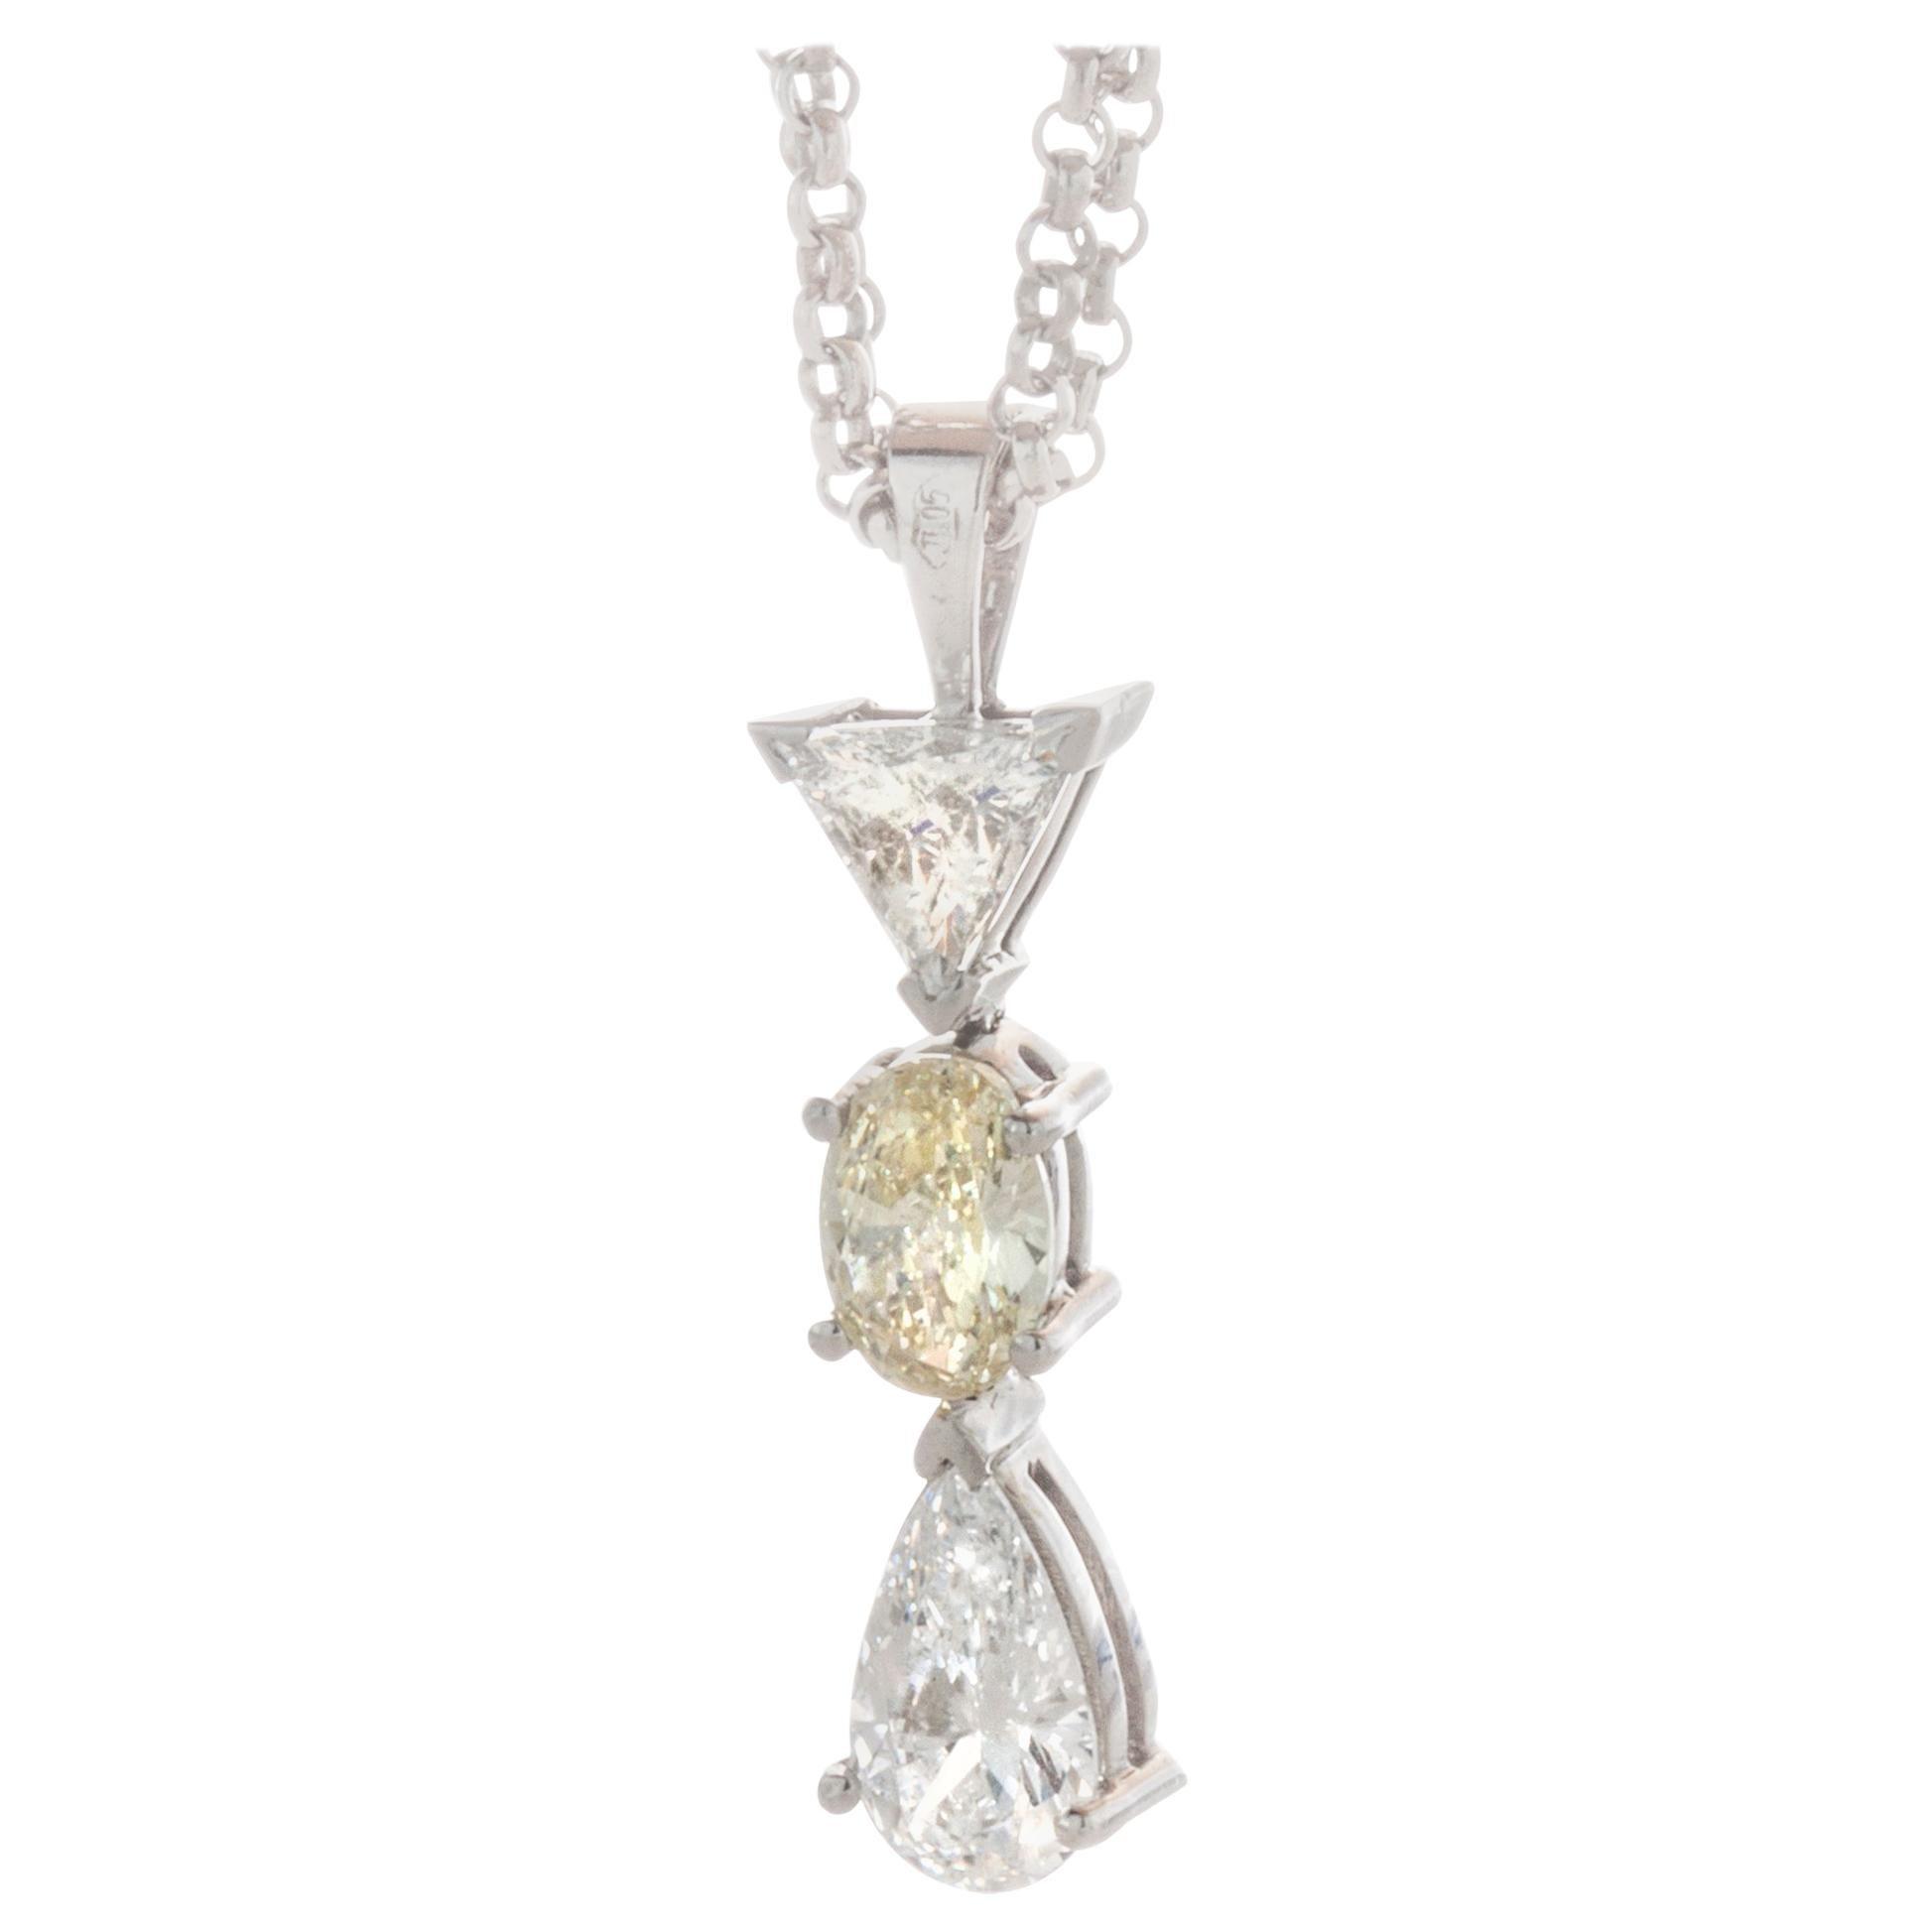 Filk 18 Karat White Gold Italian Necklace